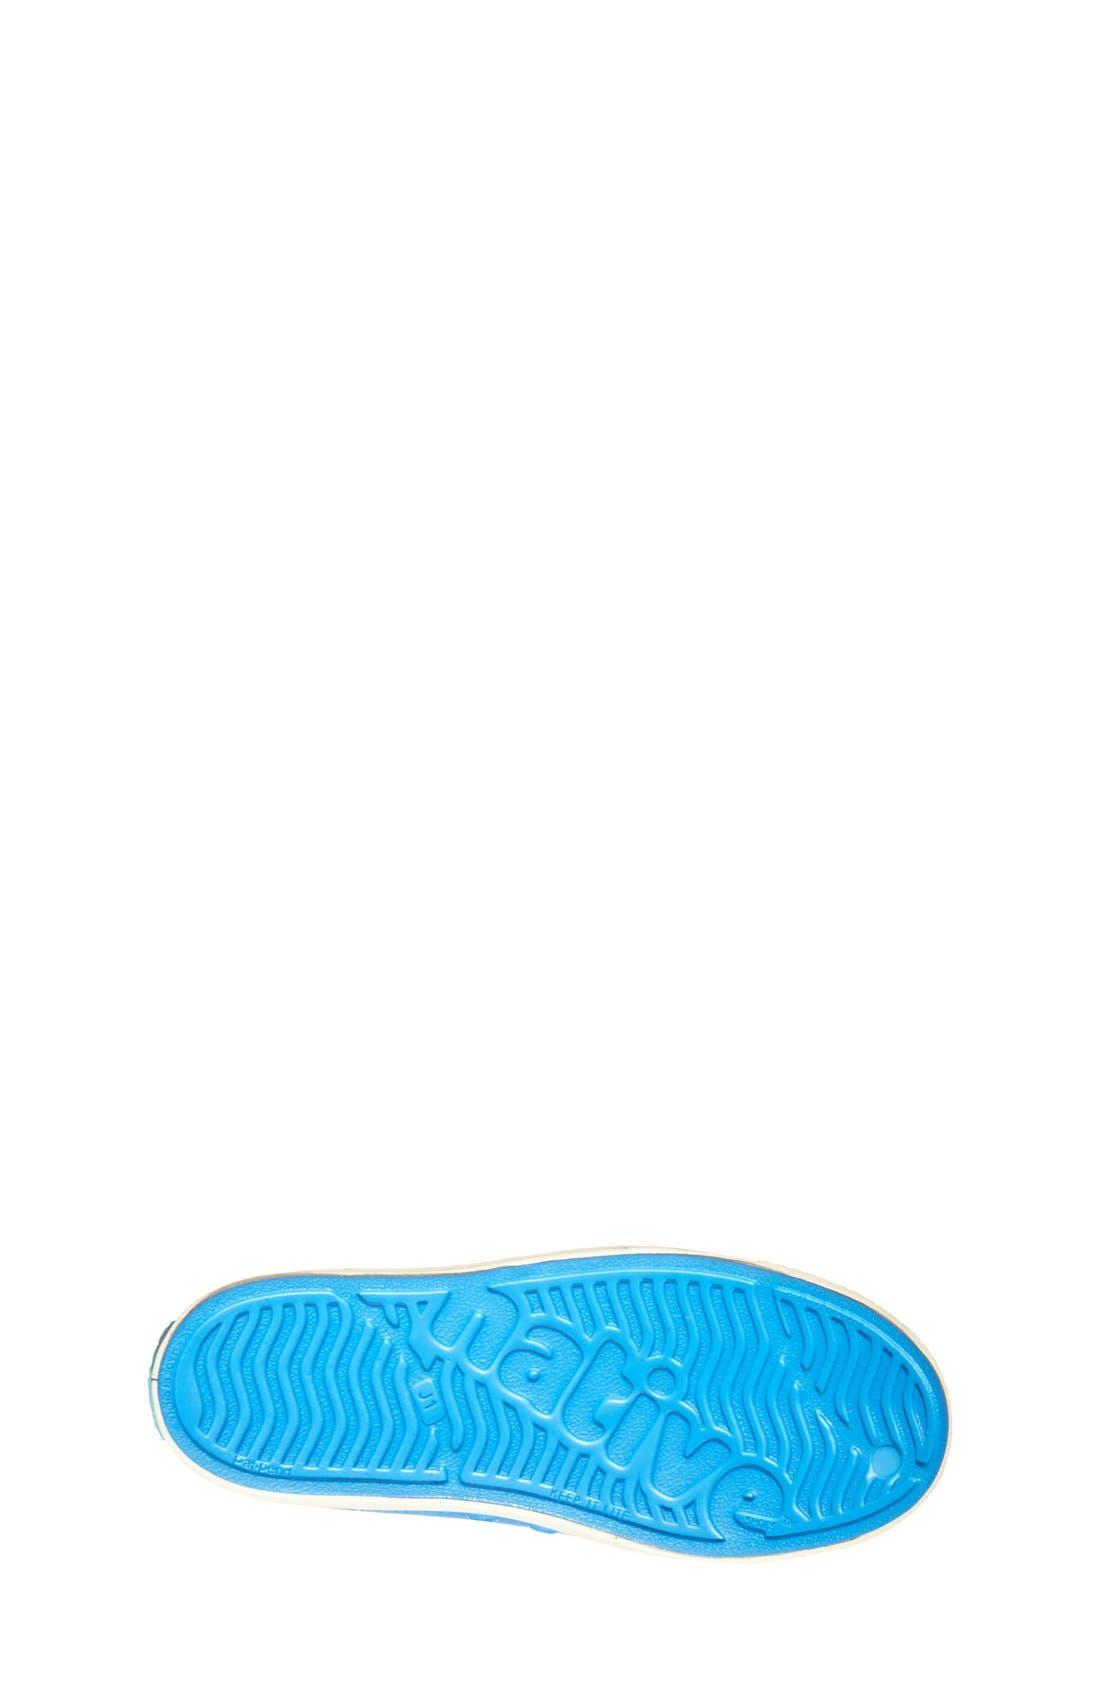 'Jefferson' Water Friendly Slip-On Sneaker,                             Alternate thumbnail 206, color,